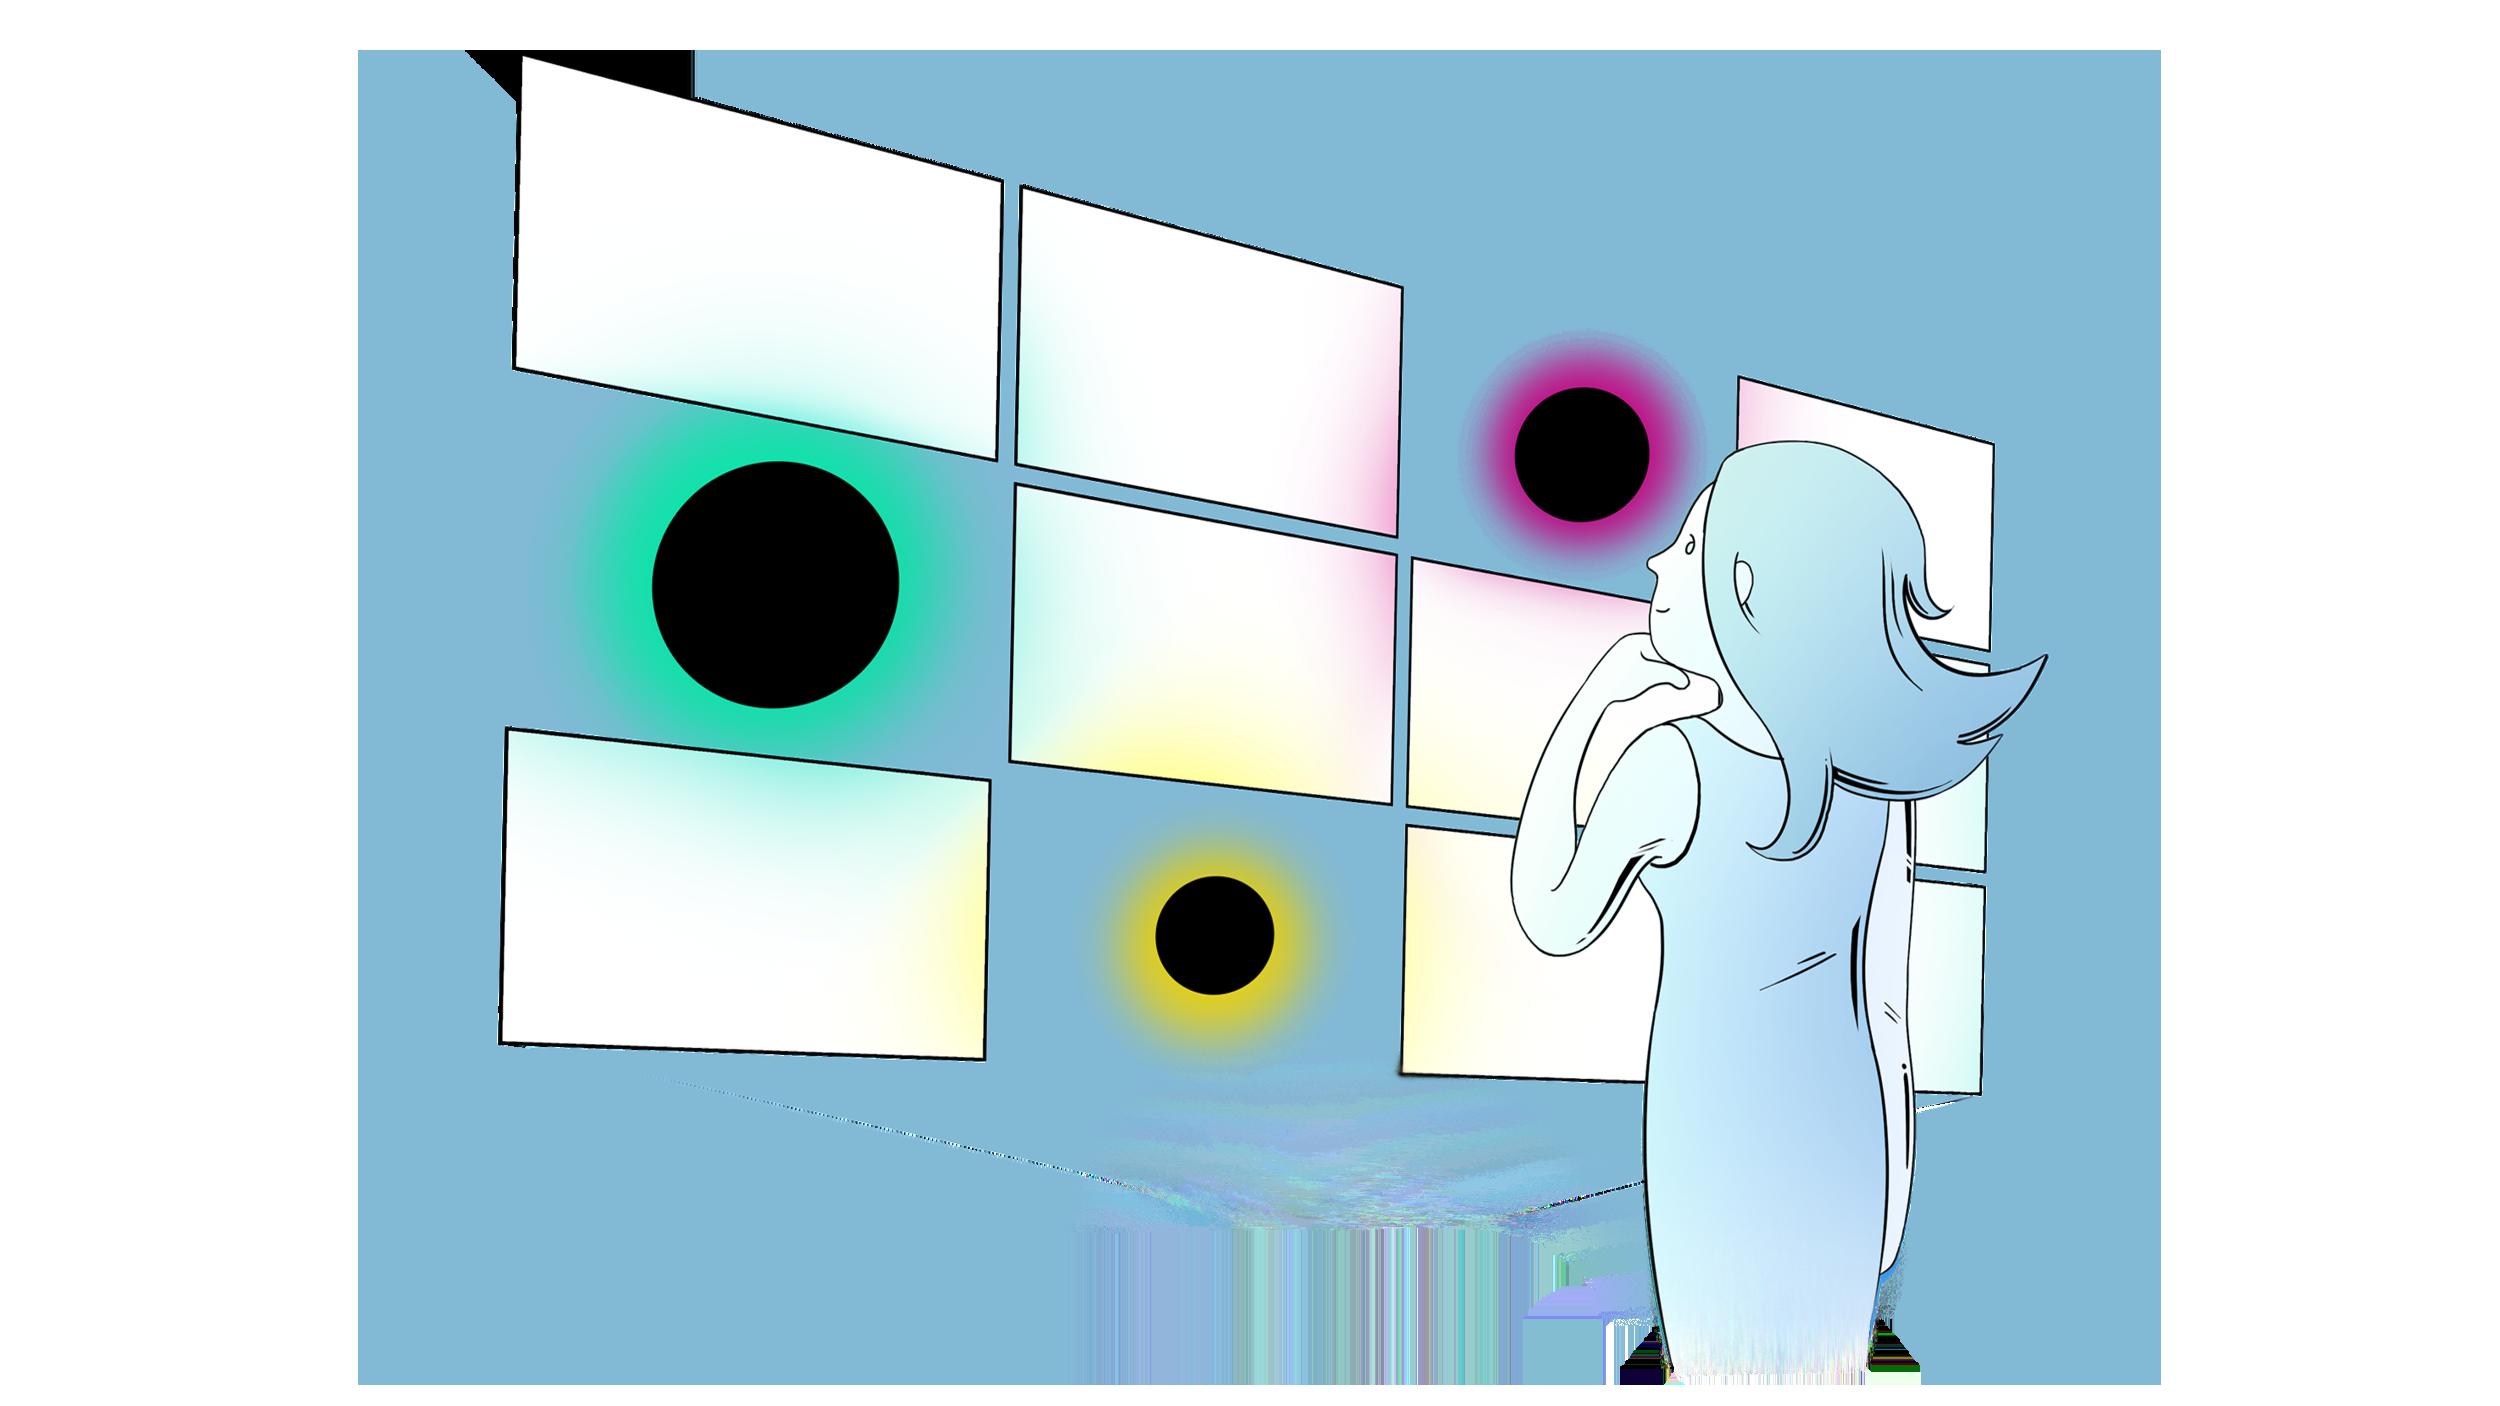 magnets_illustrations_05.1_kandinsky (1).png